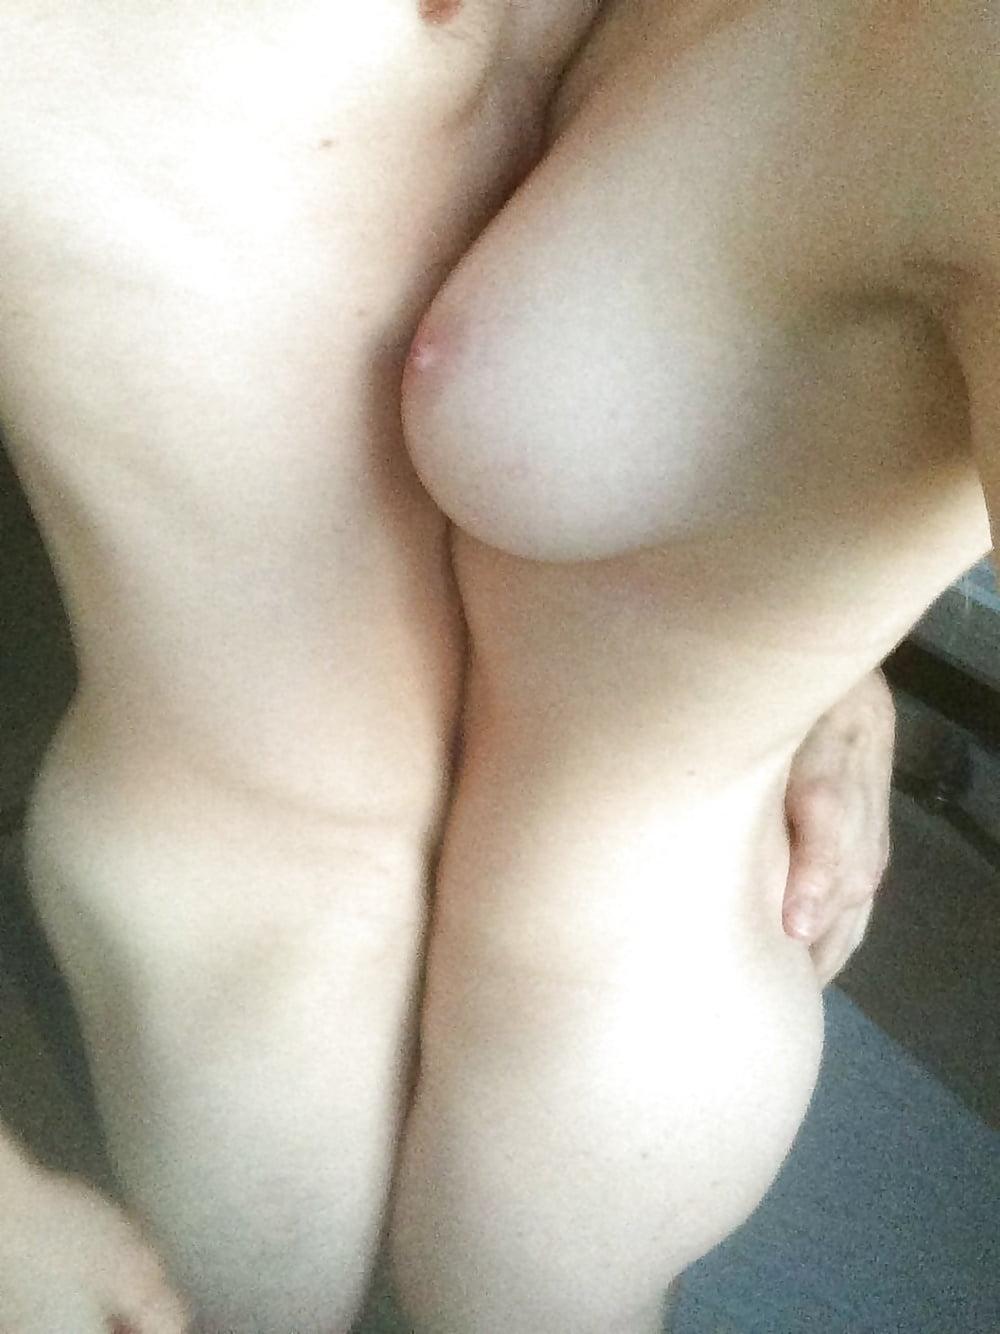 Amanda seyfried naked pics-5604